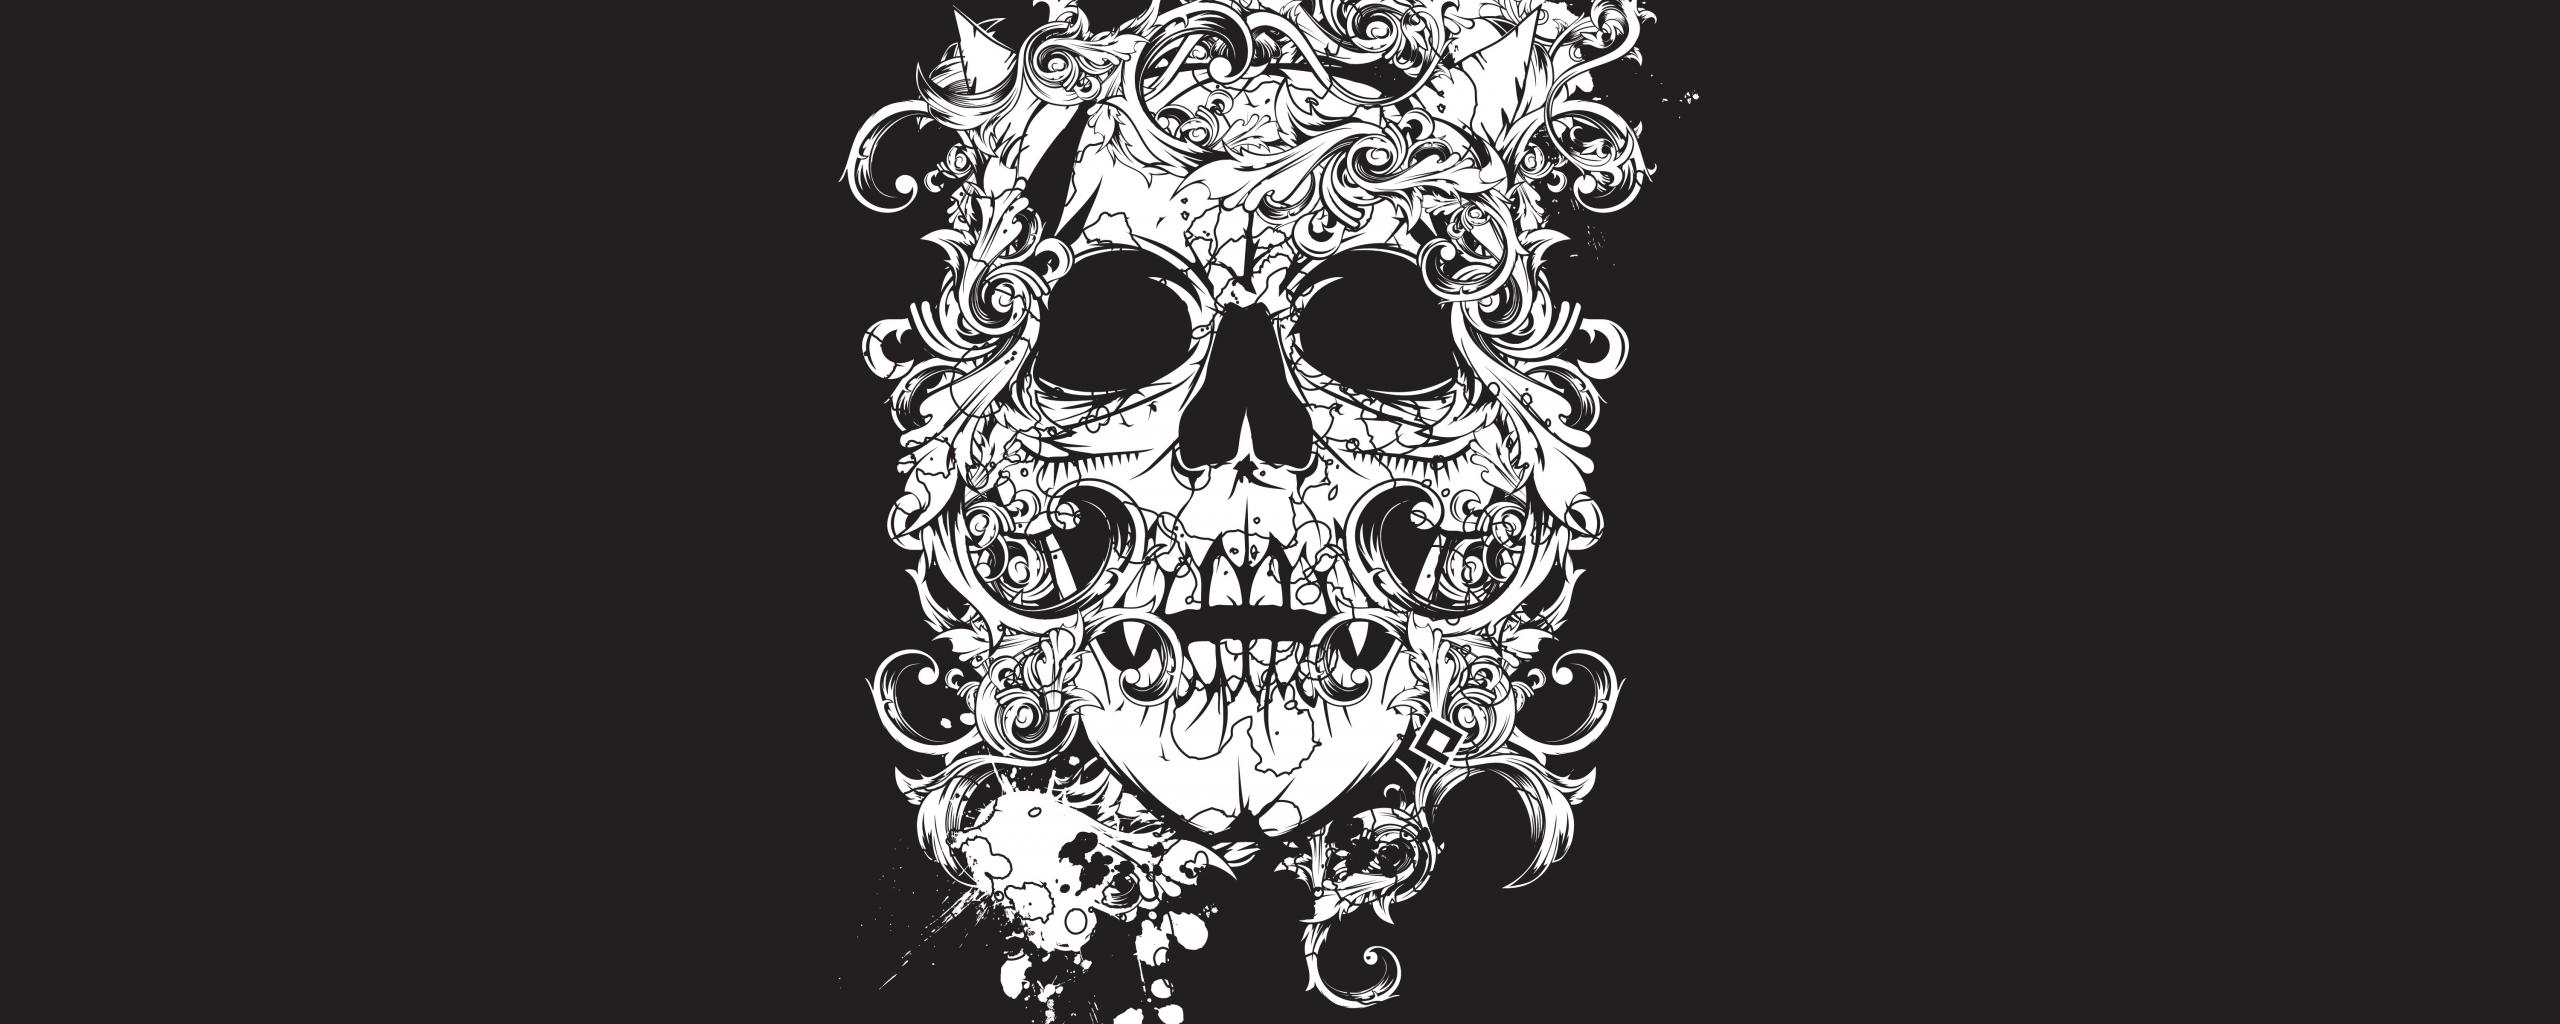 Desktop Wallpaper Skull Tattoo Hd Image Picture Background 1cnuyu